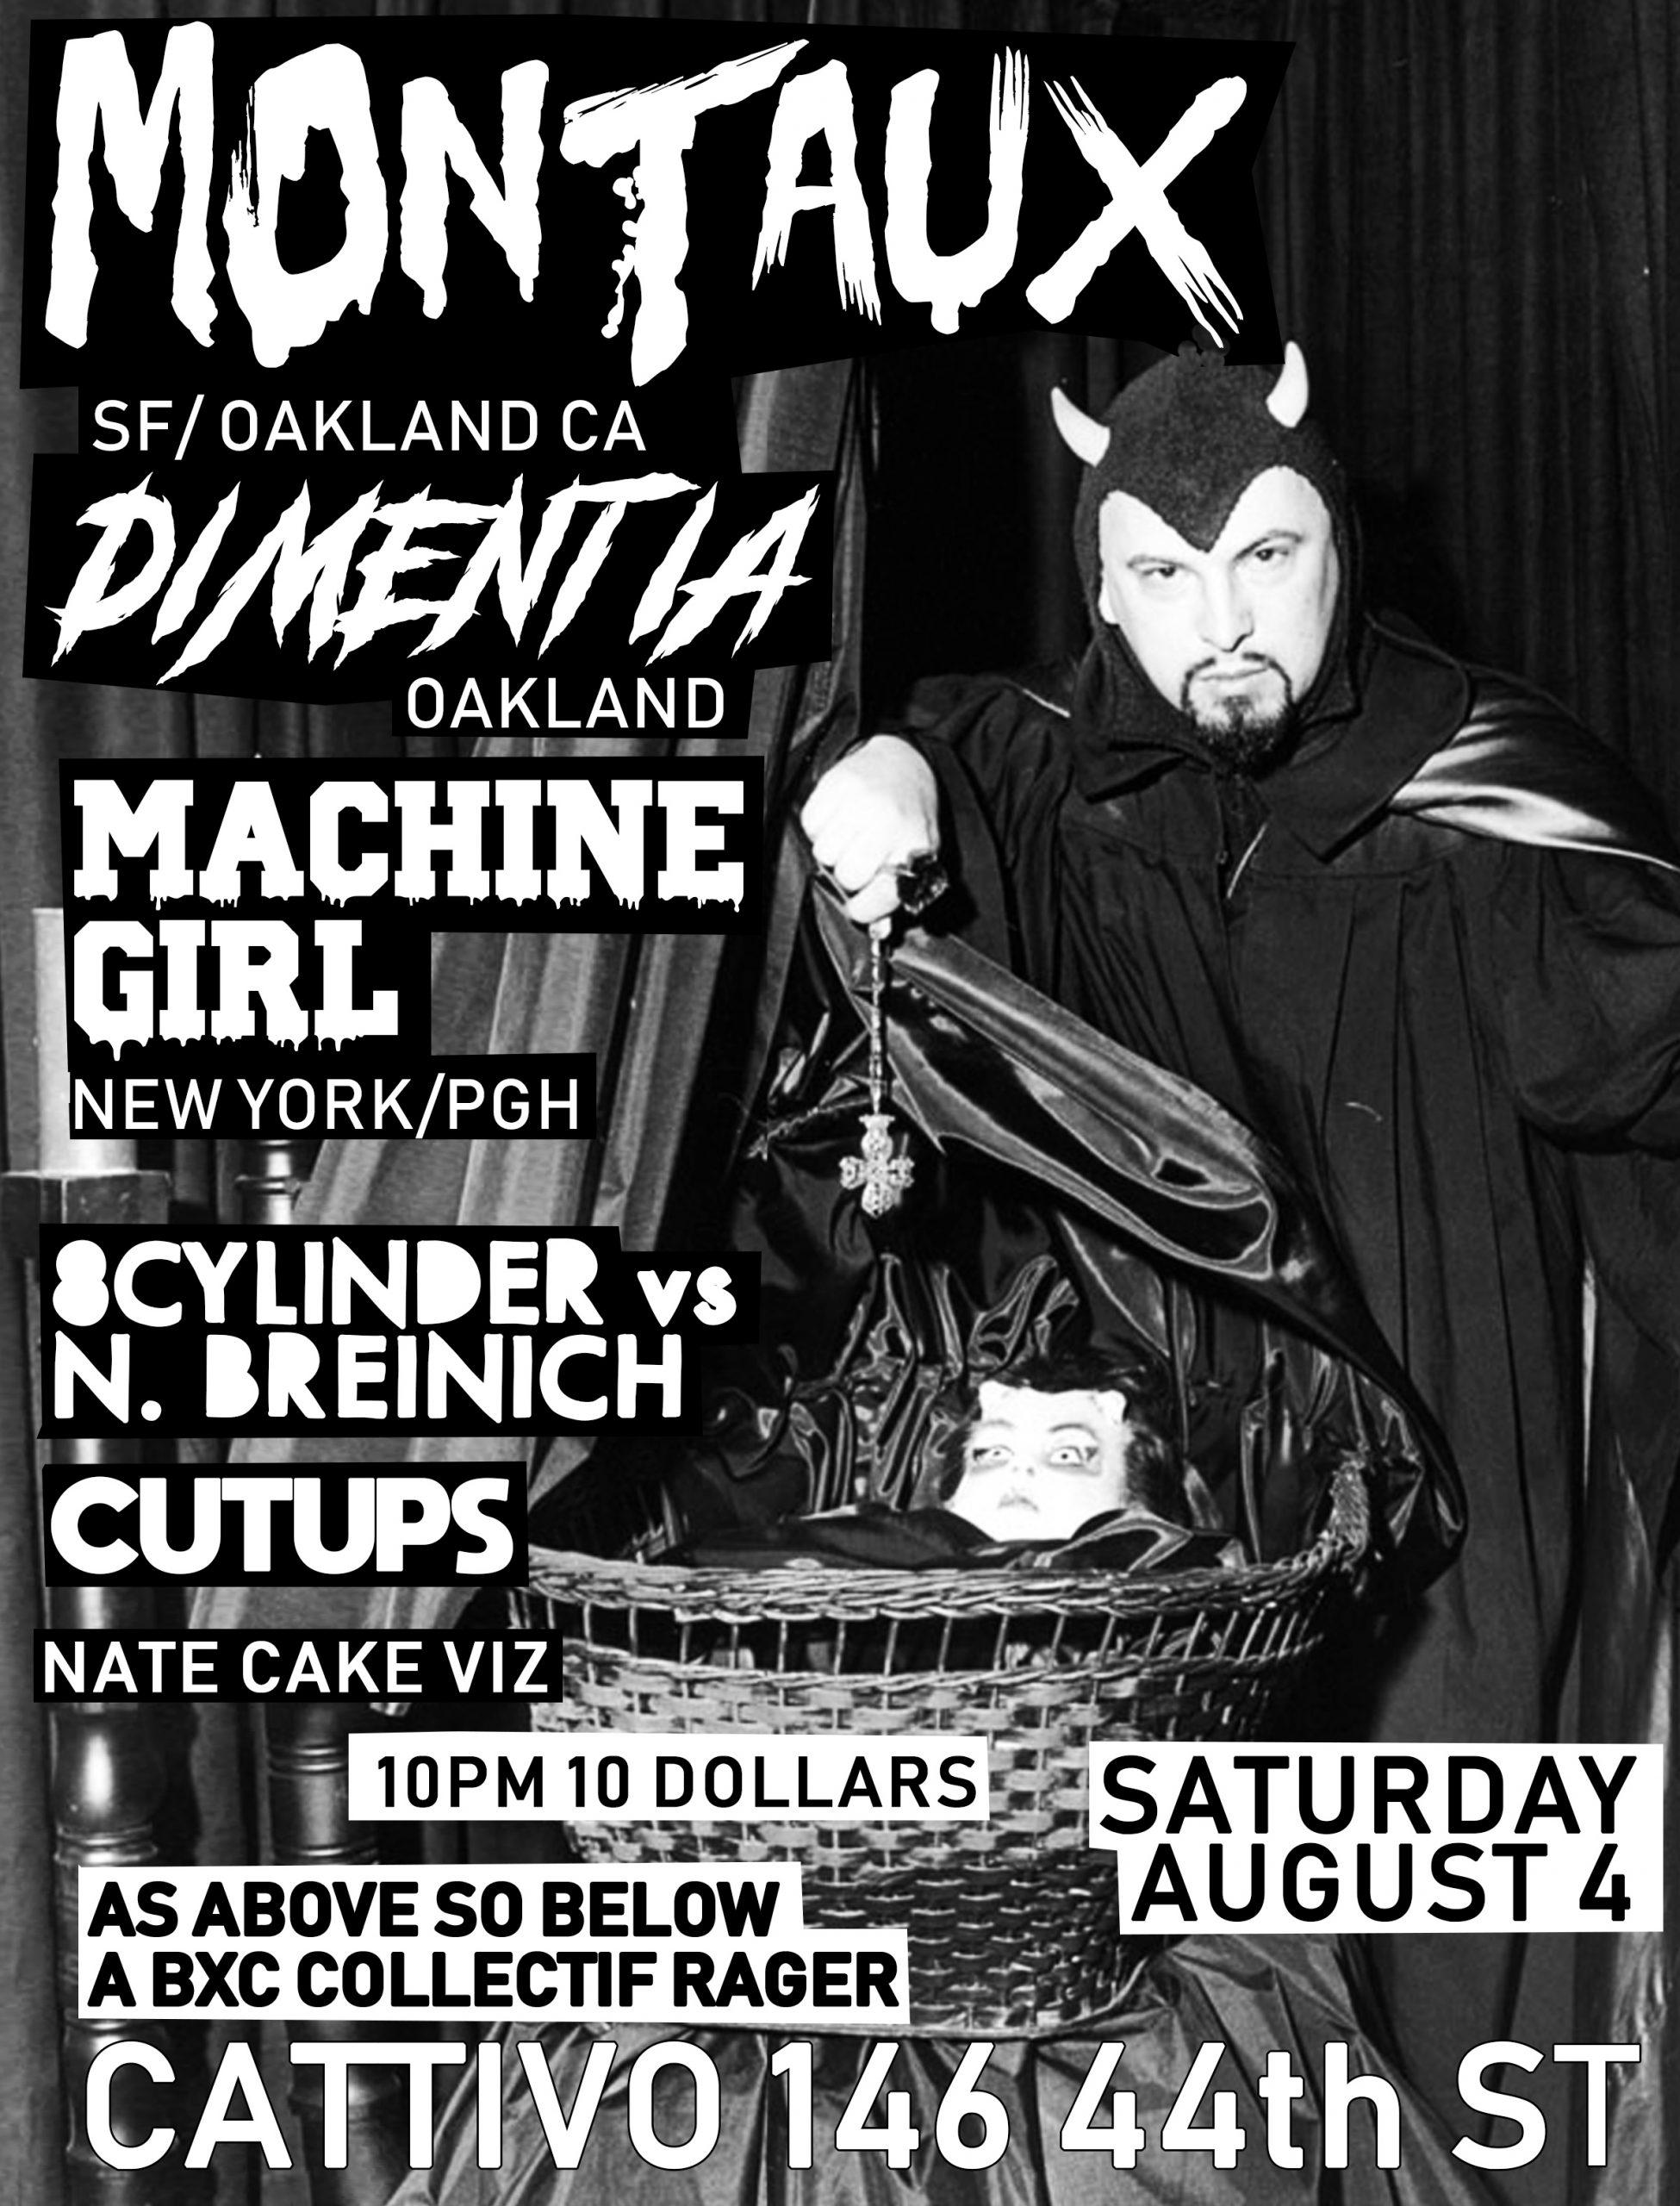 Sat Aug 4th Montaux, Dimentia, Machine Girl, 8cylinder + N. Breinich,  Cutups @ Cattivo